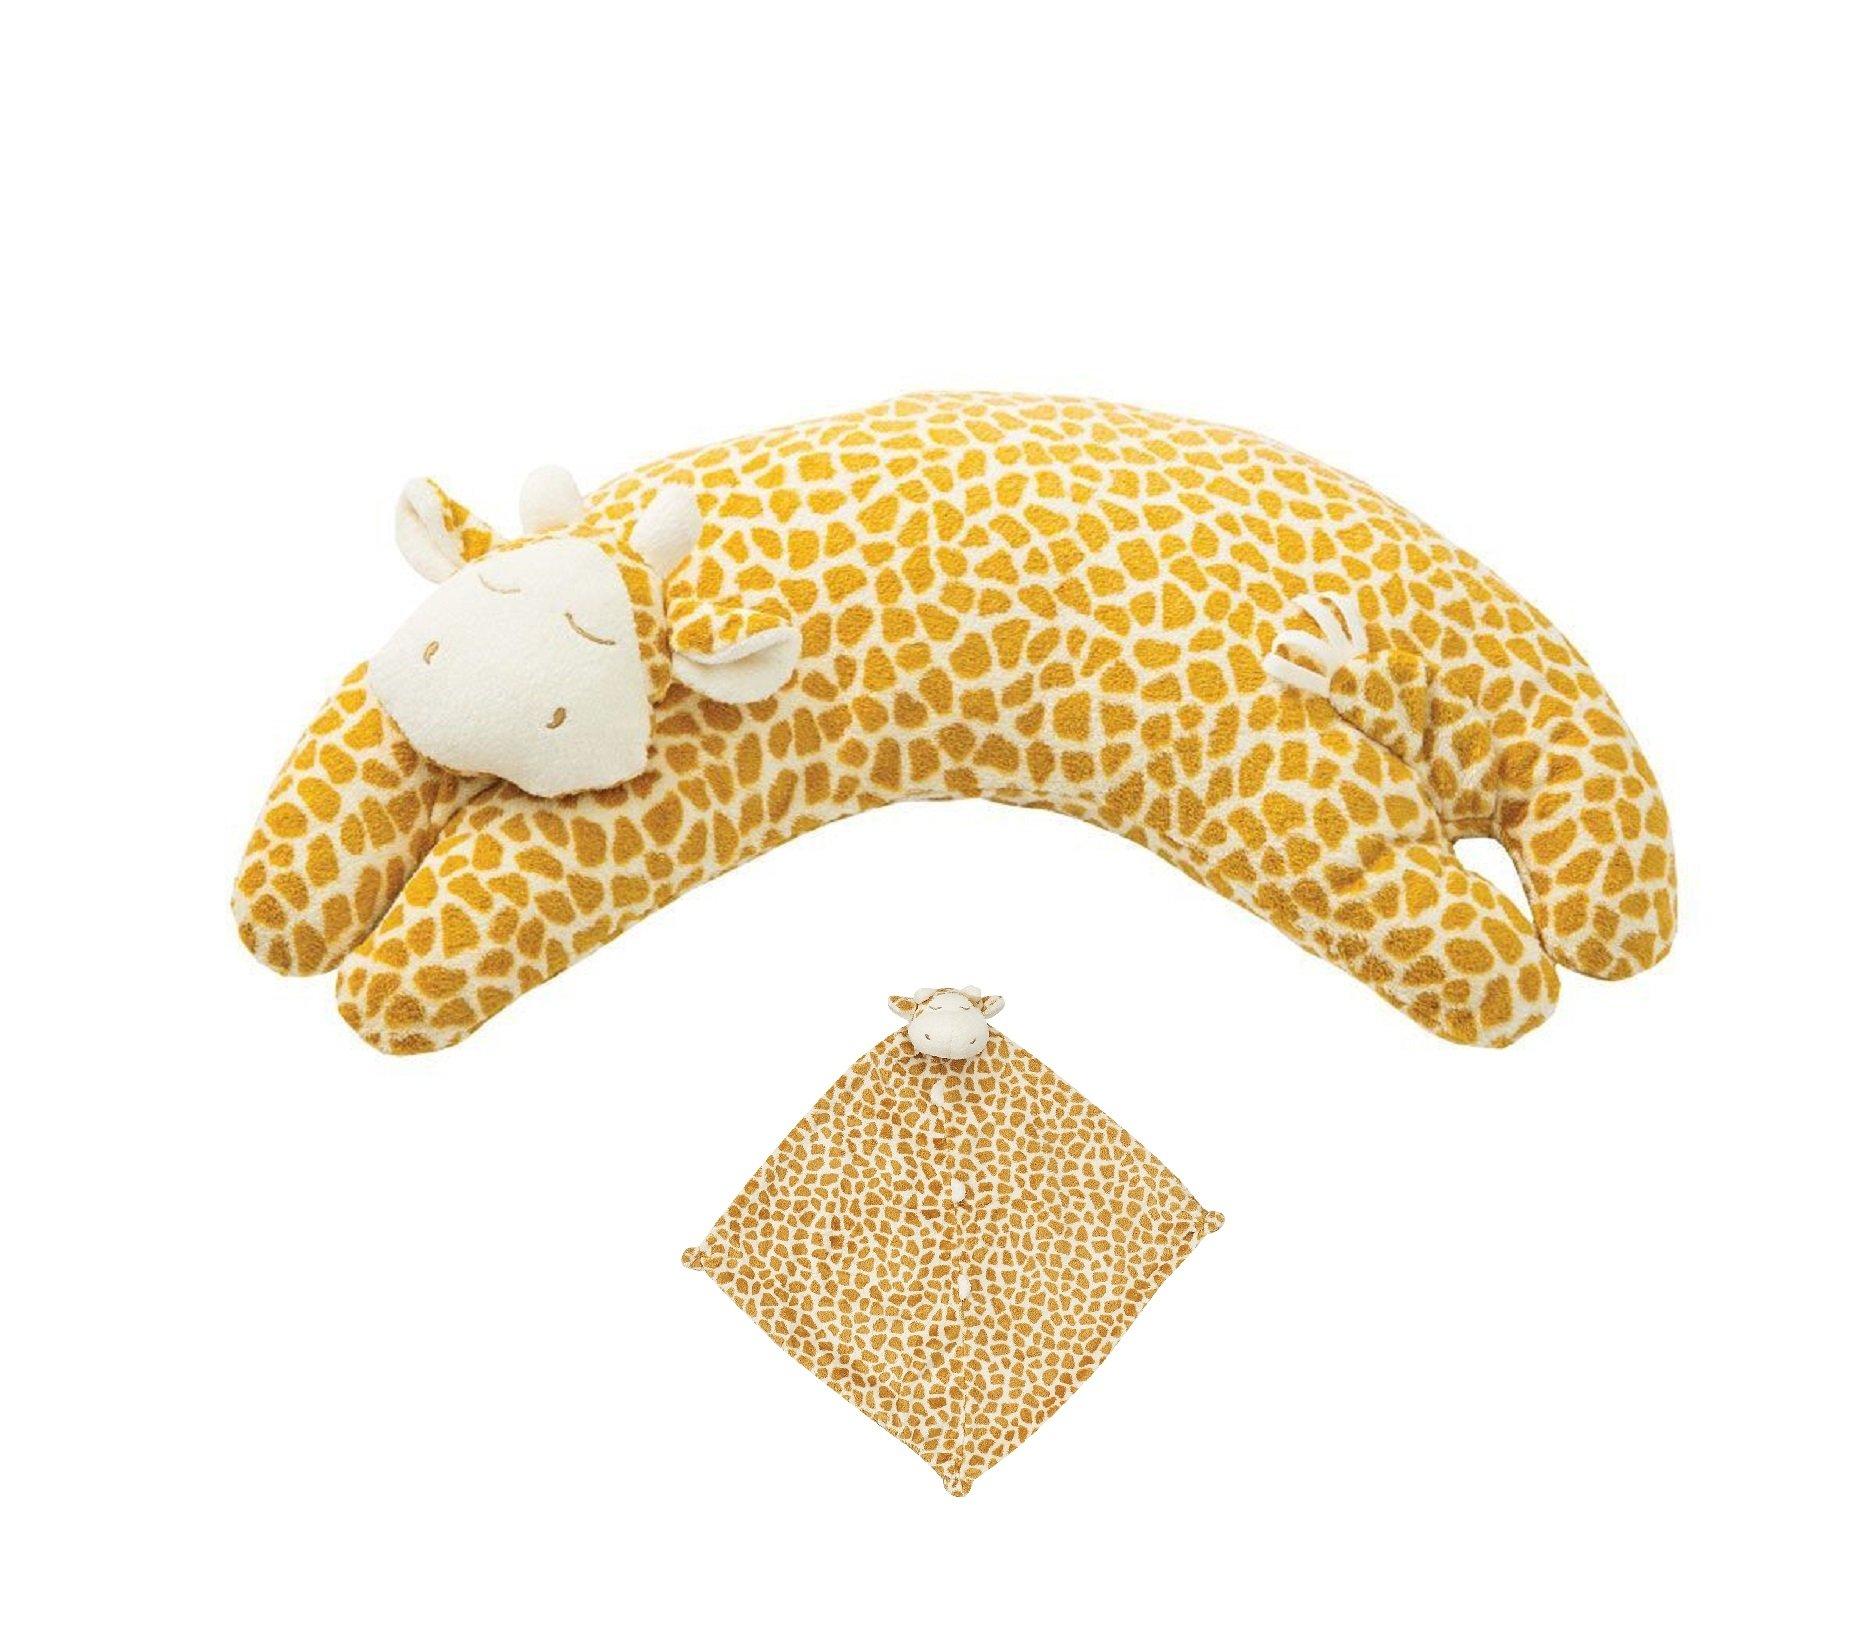 Angel Dear Baby Blankie and Pillow Gift Set, Brown Giraffe. by Angel Dear